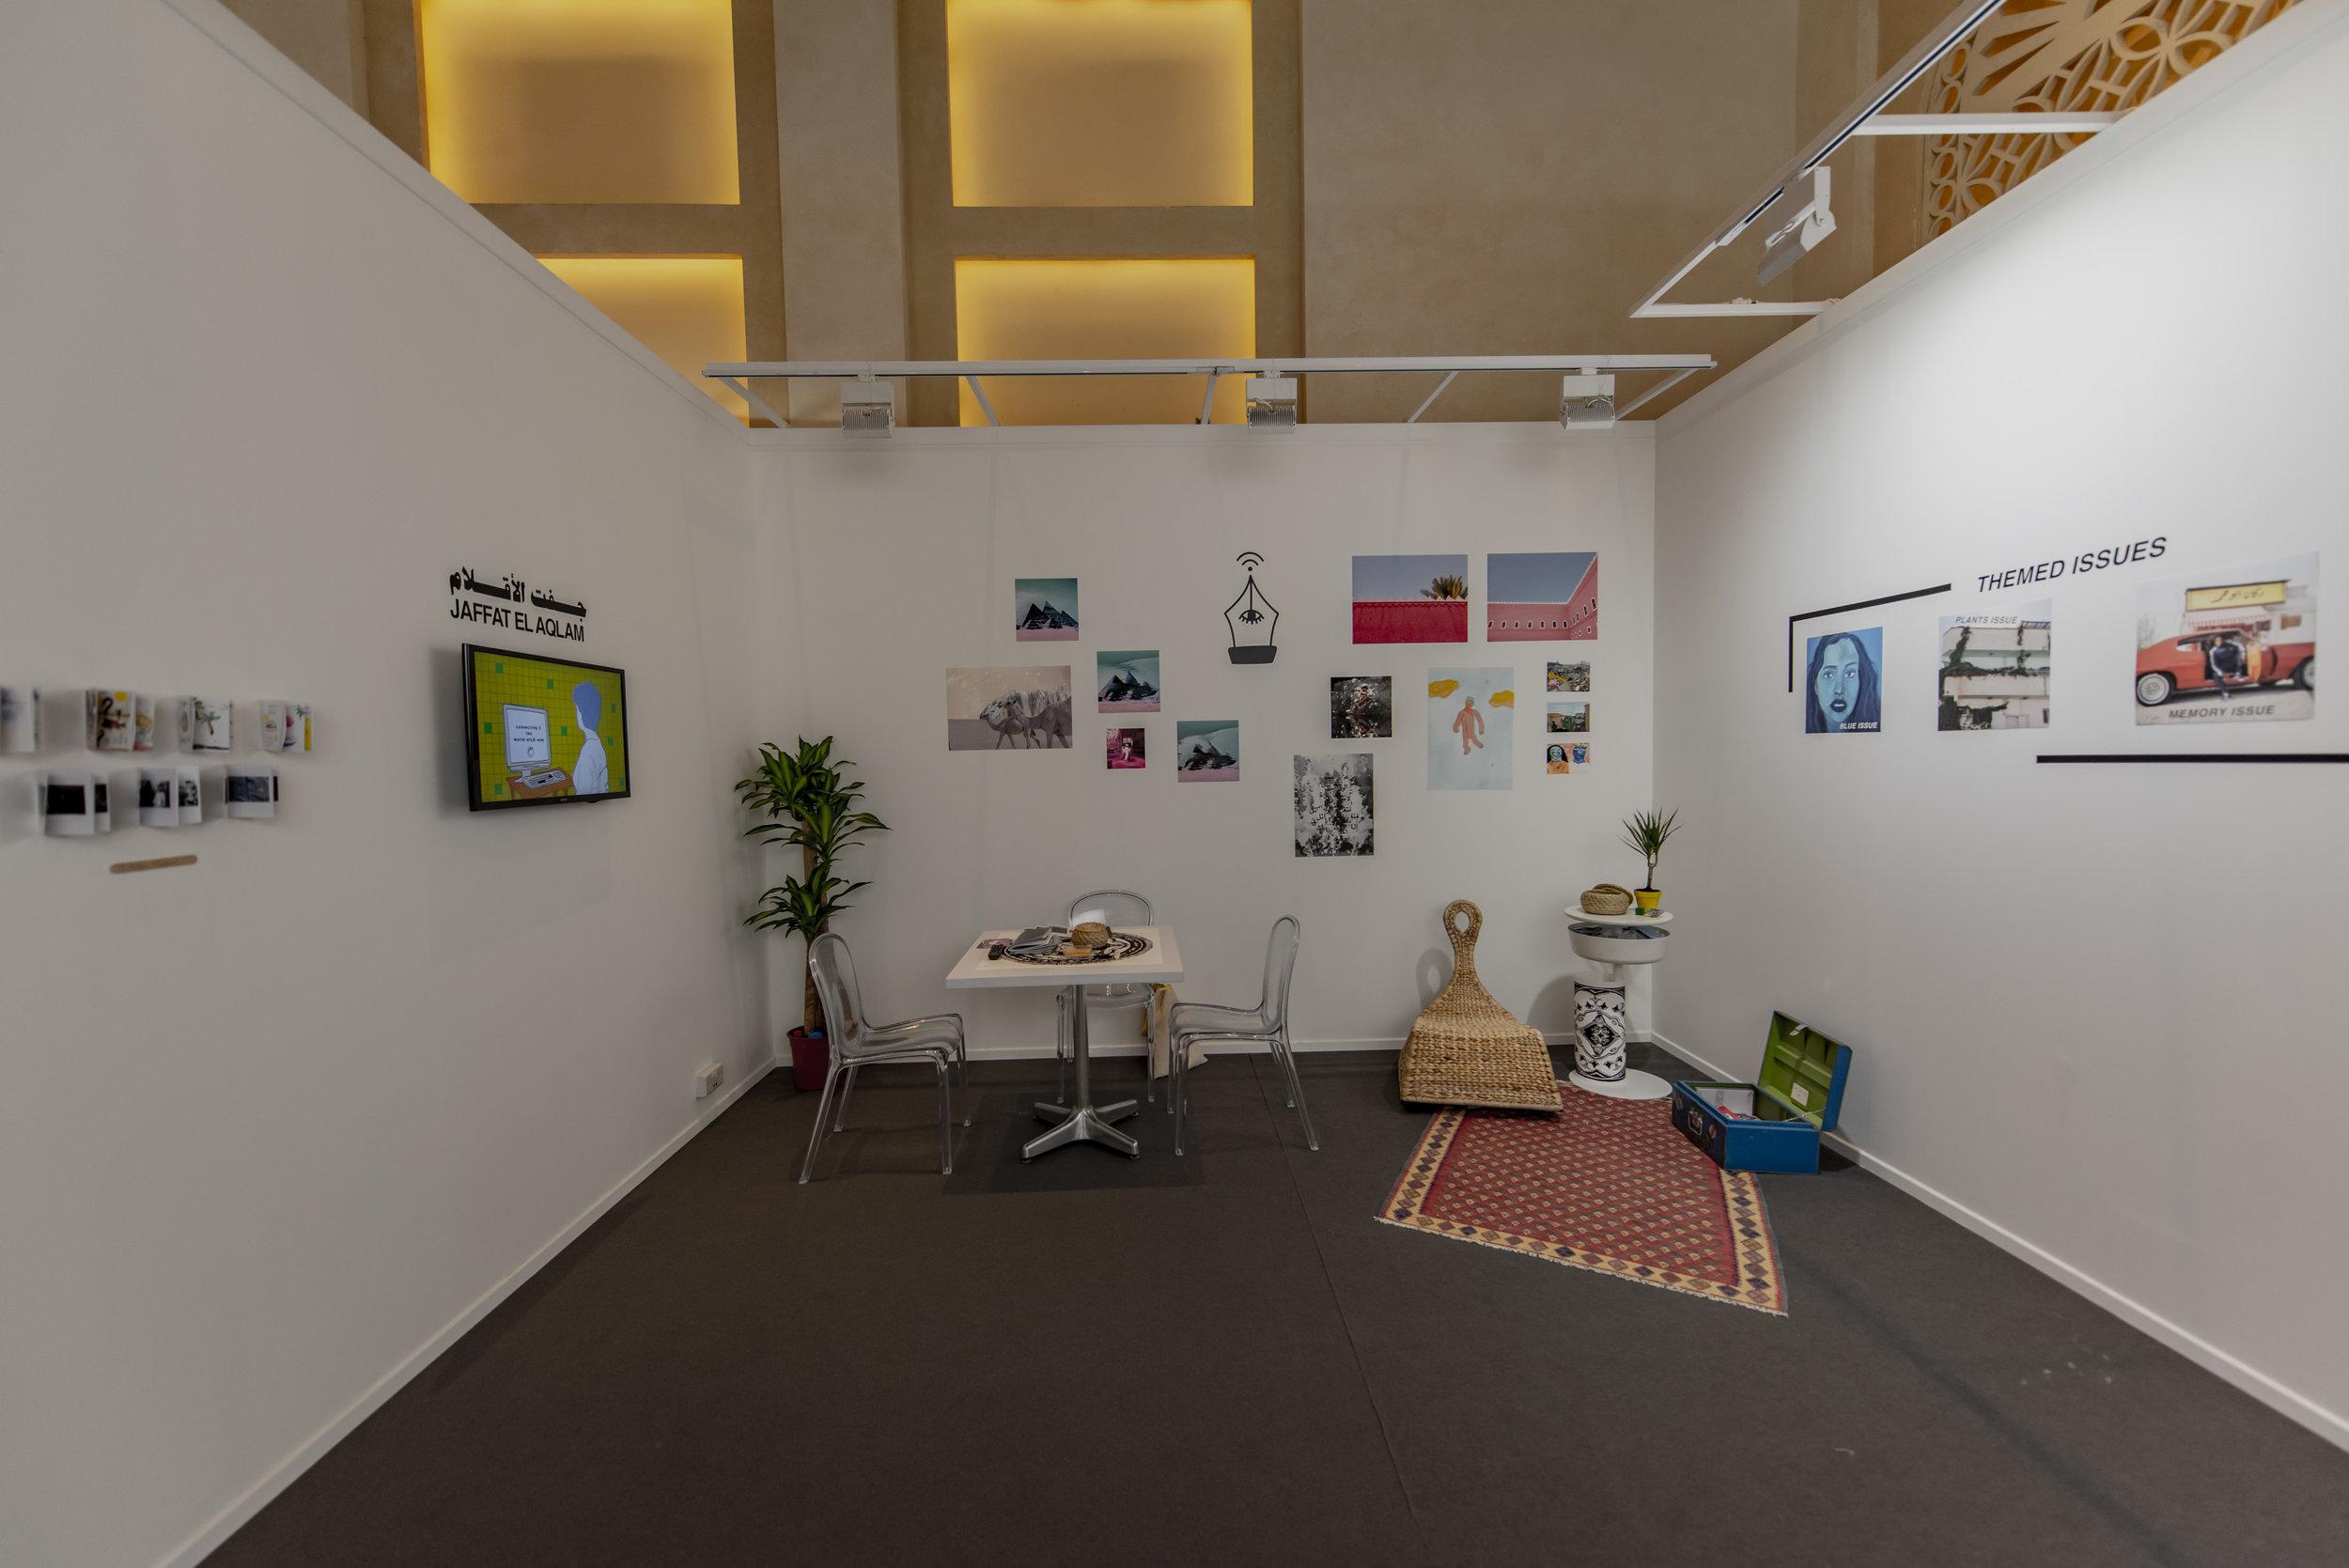 Jaffat El Aqlam, UAE NOW, Art Dubai 2019, Courtesy of Photo Solutions